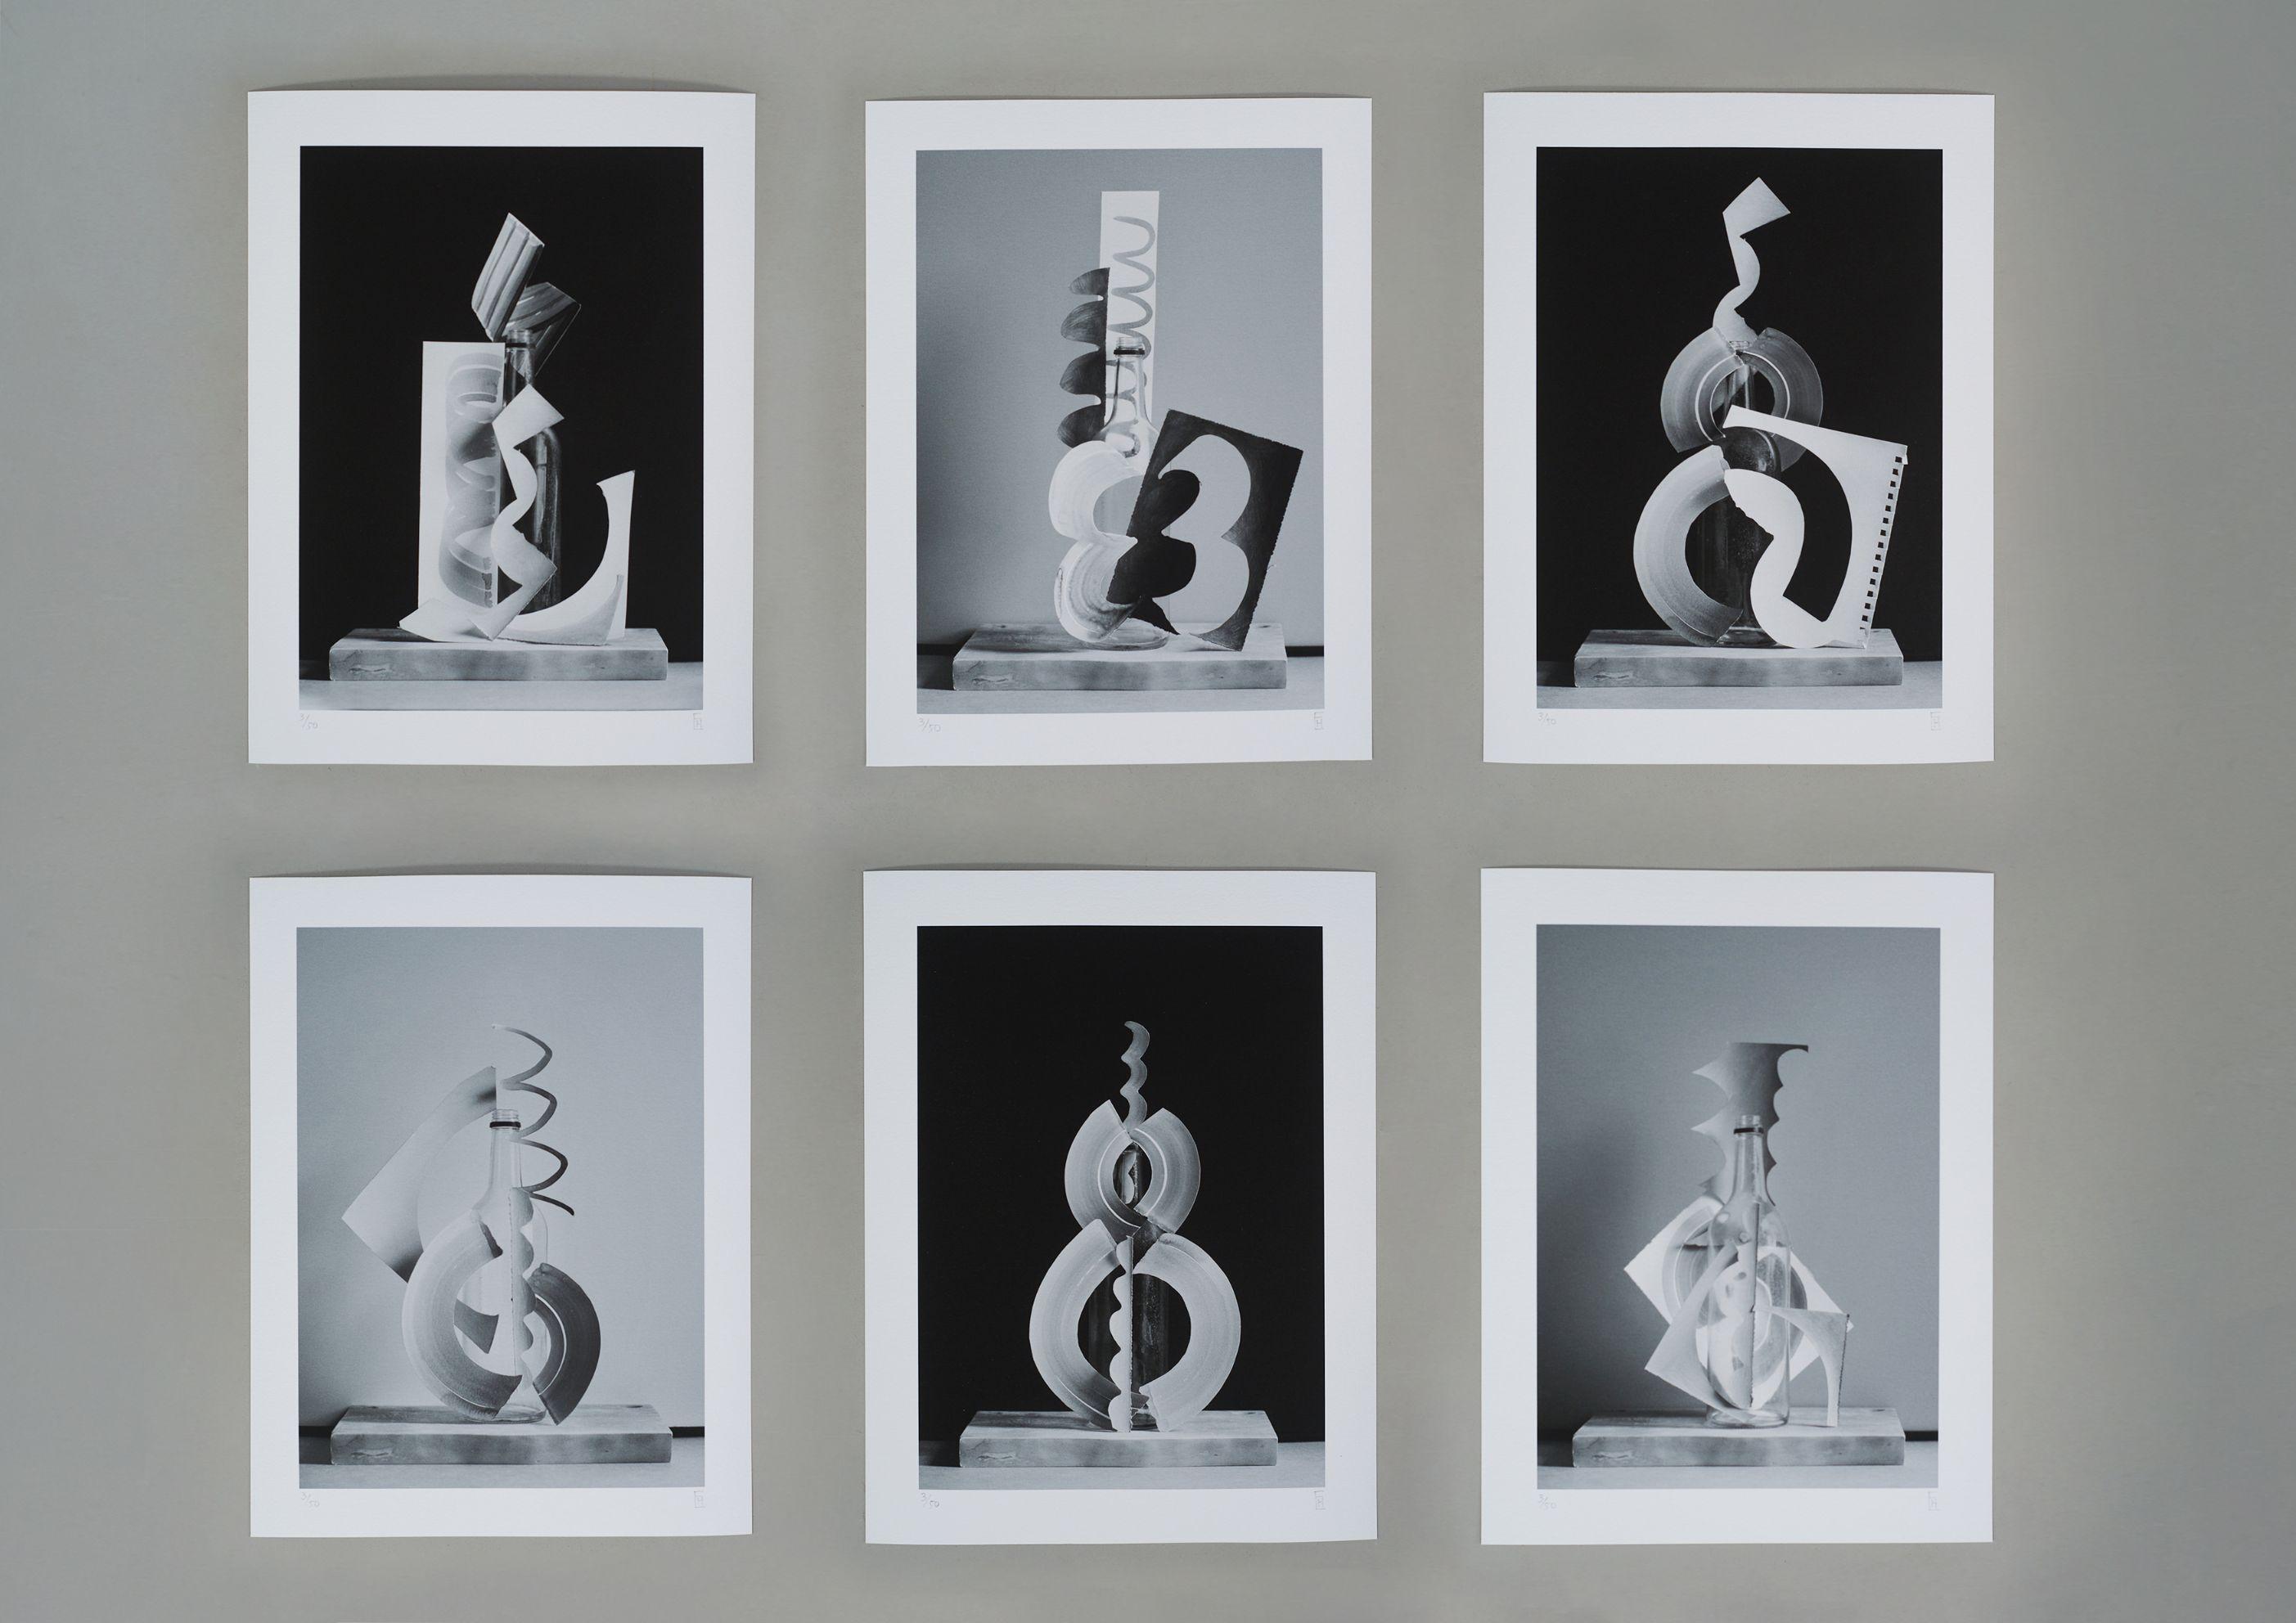 Enter the abstract - Lot 29, Edd Horder, Paper, Bottle, Chopping Board (Full Set)